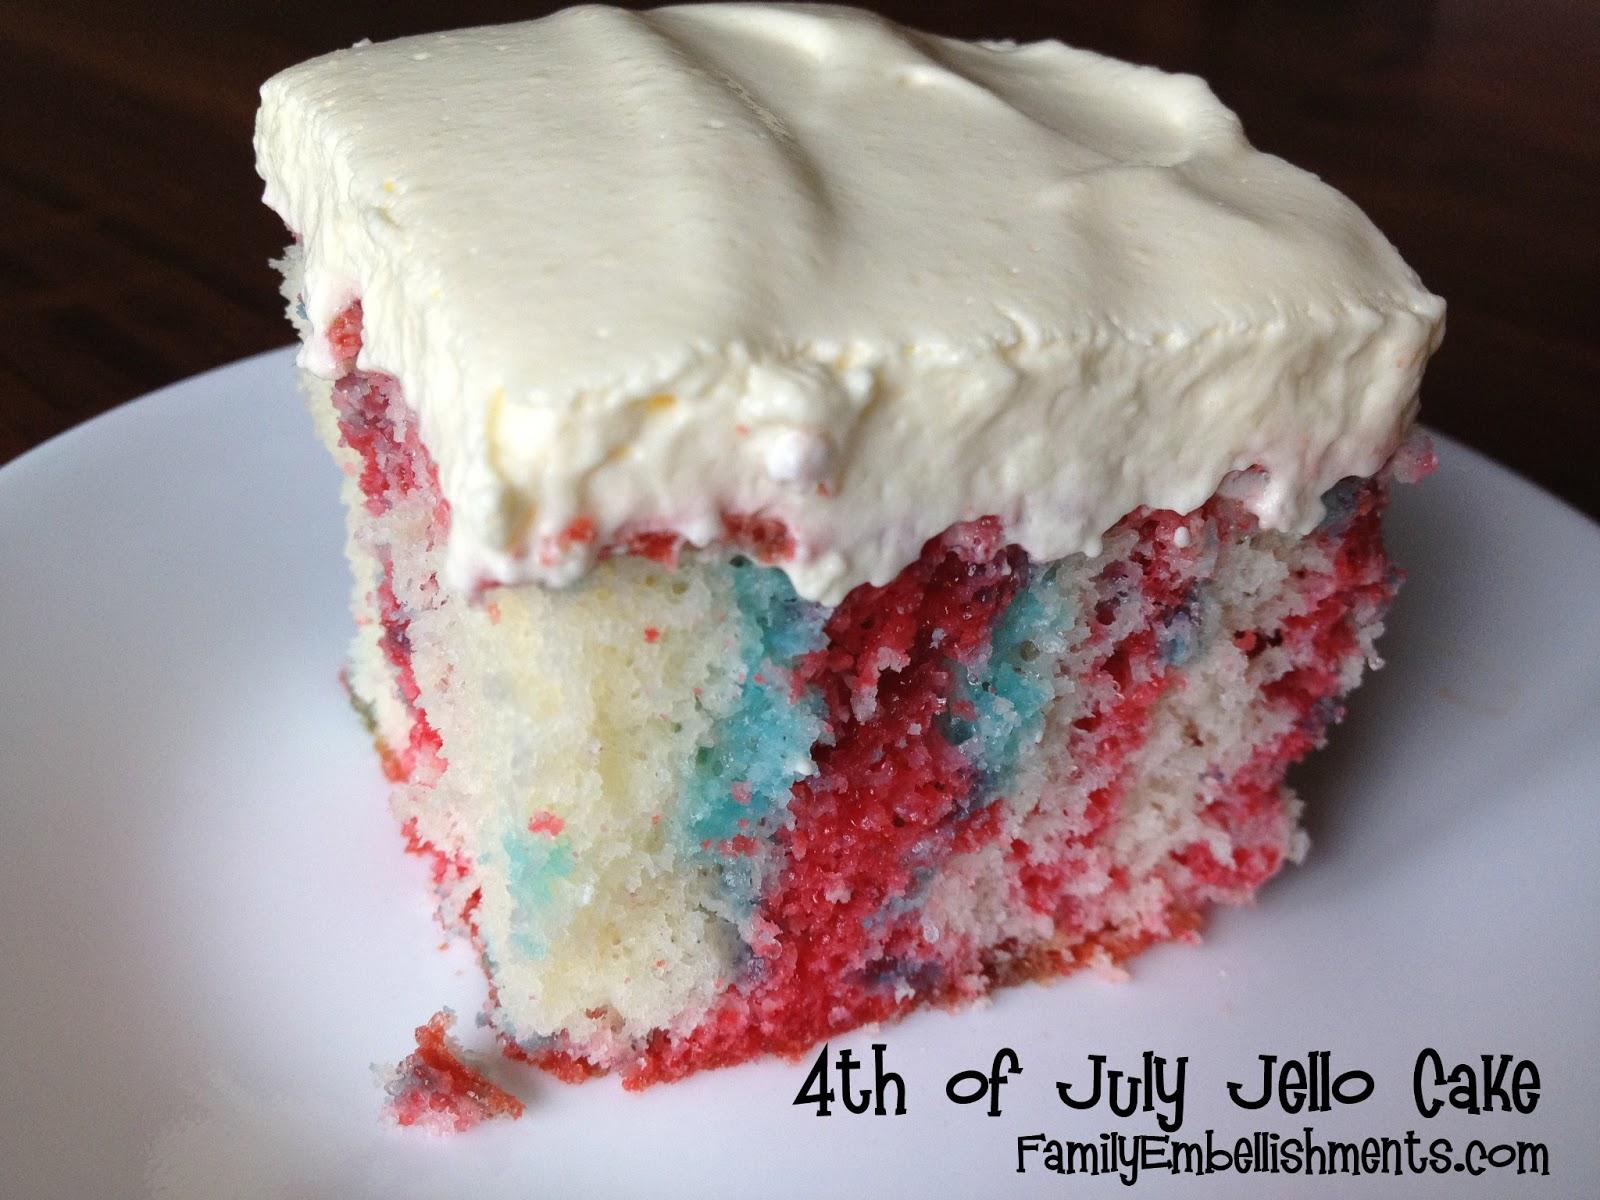 Jello Cake Frosting Recipe: Family Embellishments: 4th Of July Jello Cake